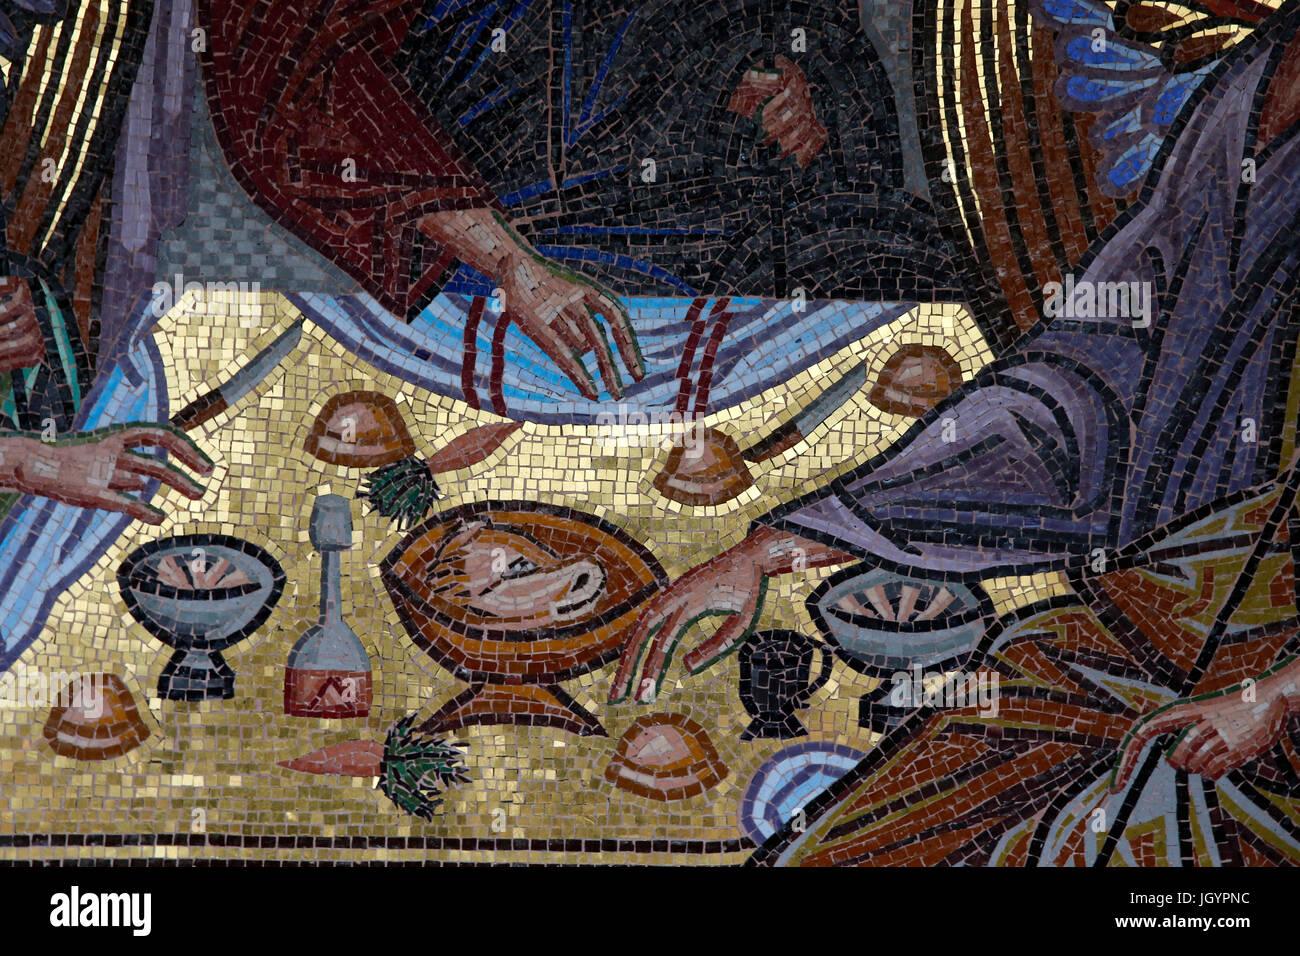 Kykkos monastery, Cyprus. 'Old Testament Trinity' mosaic detail. - Stock Image